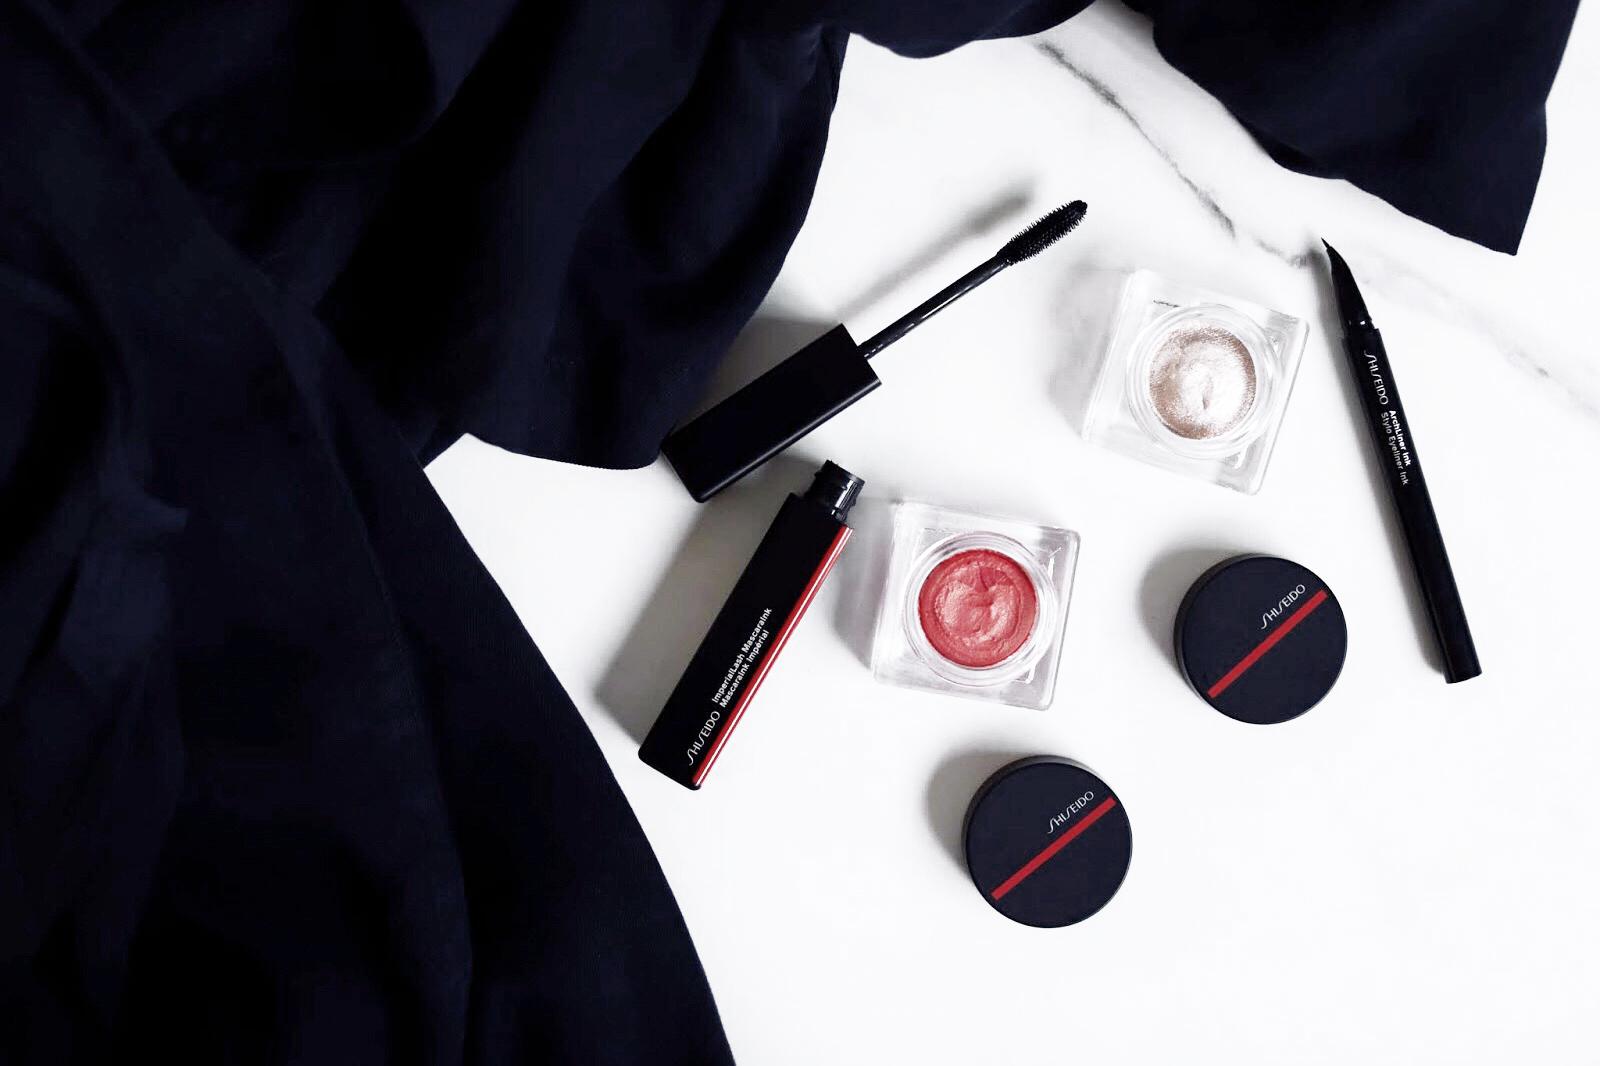 nouveau maqullage shiseido avis test swatch aura dew solar 02 sonoya 01 blush soufflée mascara Imperial Lash Ink eyelinerarchLiner Ink kajal Ink Artist